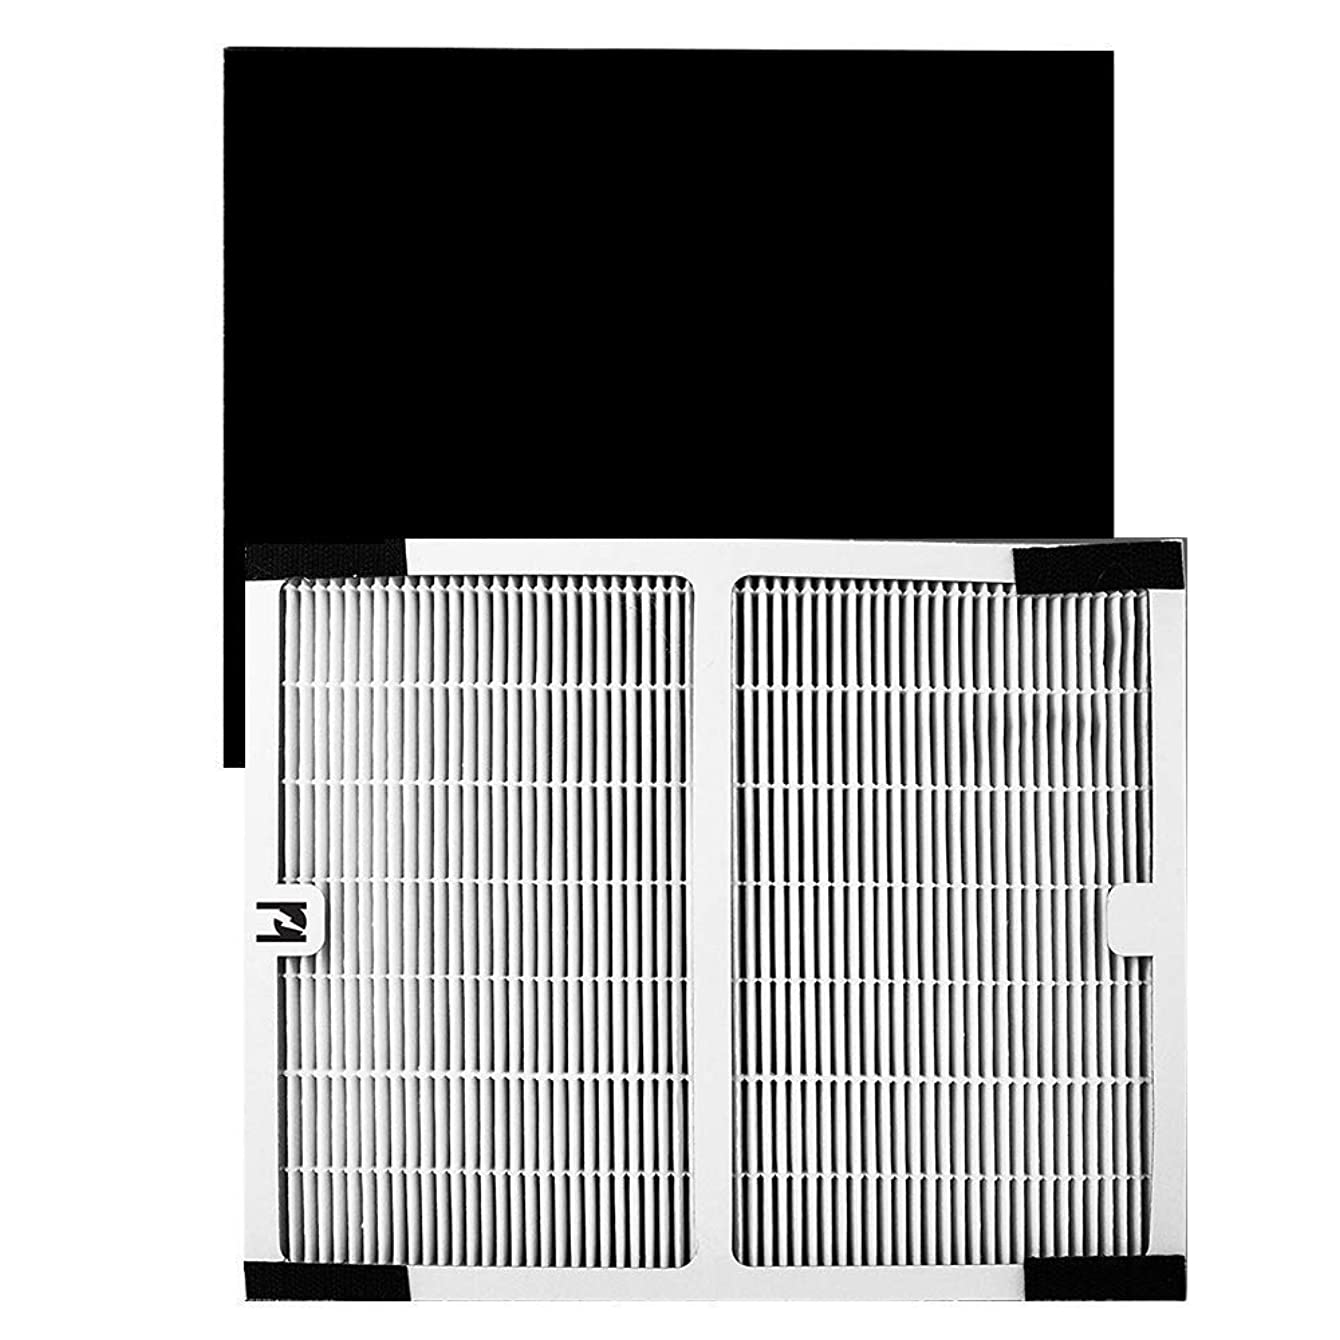 Replacement Idylis Air Purifier True HEPA Filter, Compatible With Idylis Air Purifiers Idylis AC-2119, IAPC-10-140, IAP-10-100, IAP-10-150 Model # IAF-H-100A, Includes 1 HEPA & 1 Carbon Filter